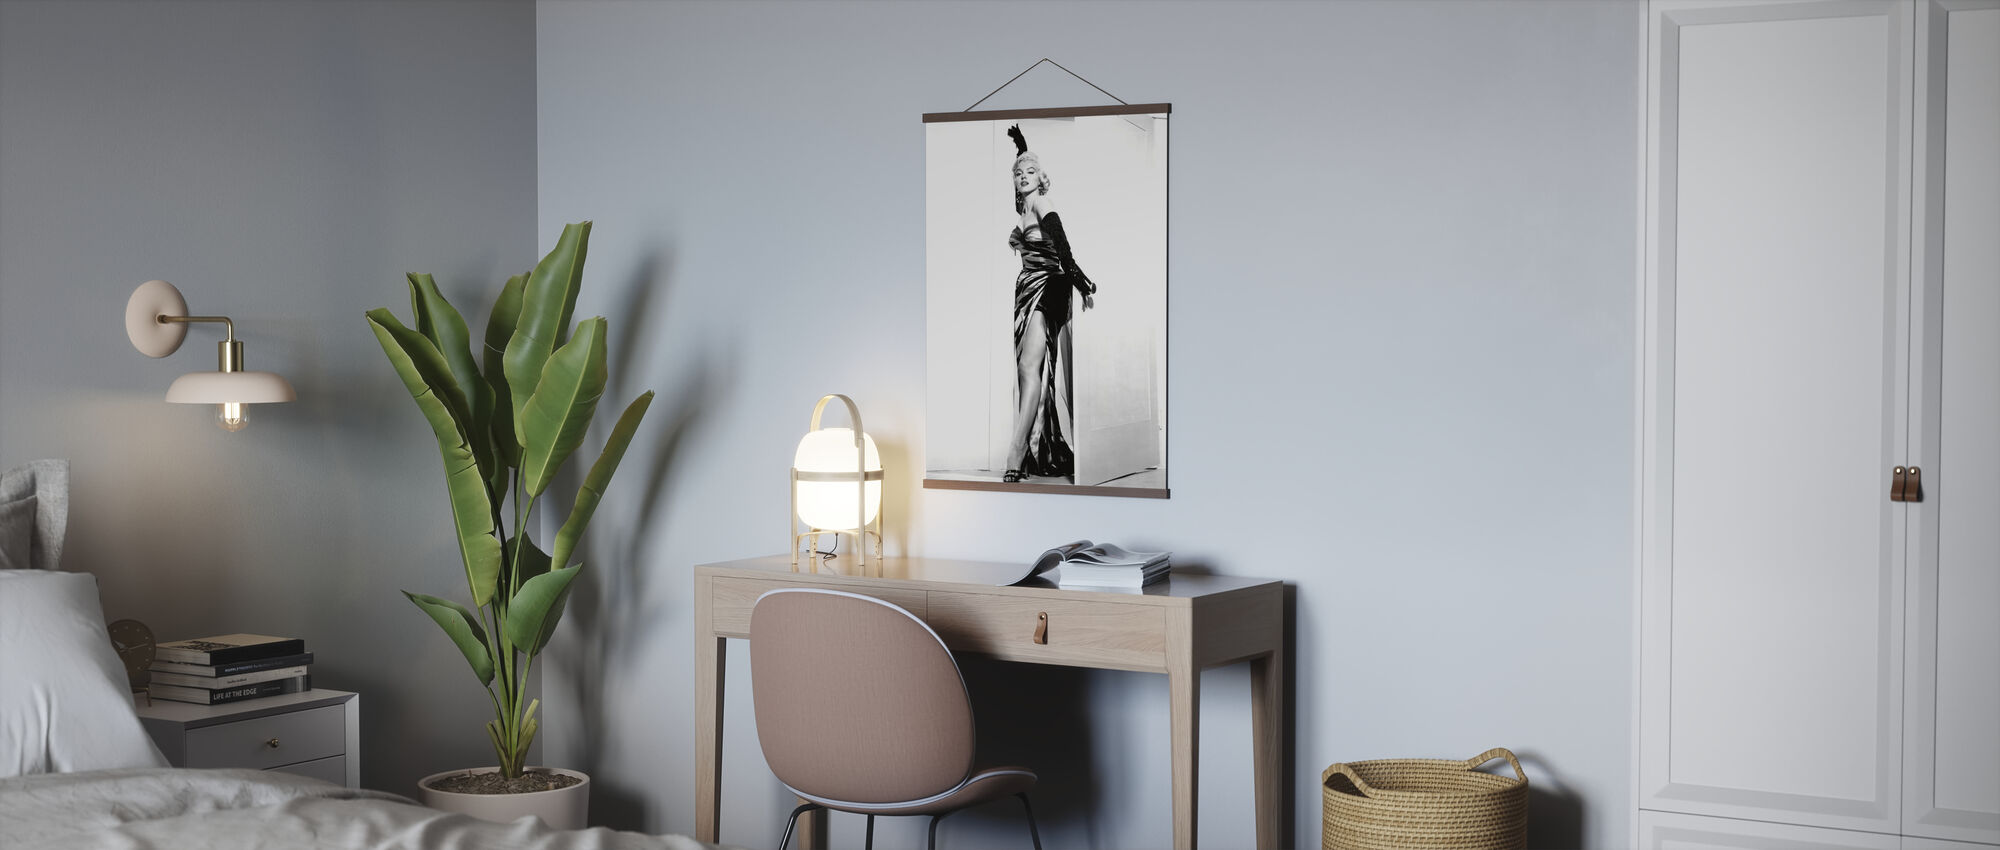 Marilyn Monroe im siebenjährigen Juckreiz - Poster - Büro